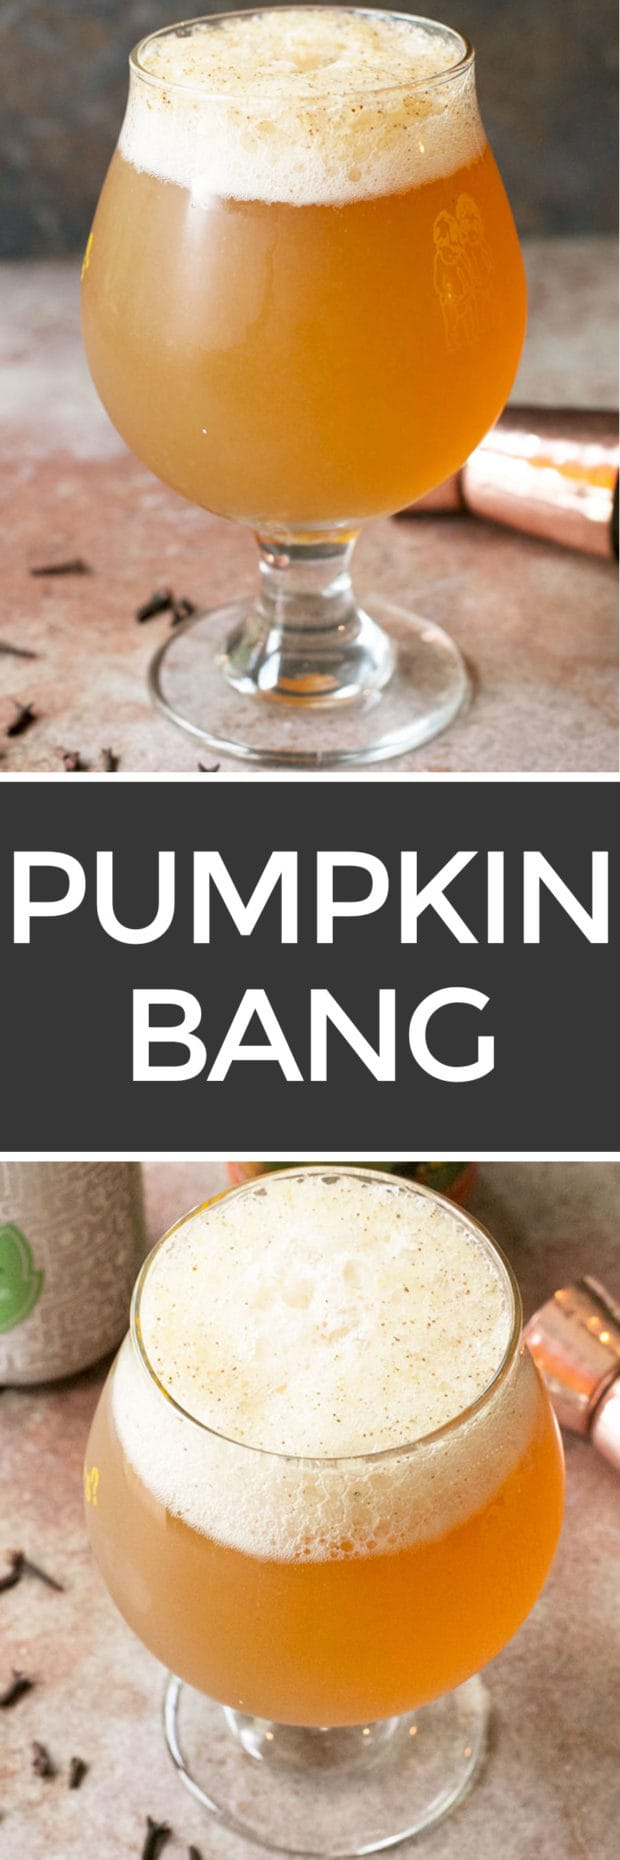 Pumpkin Bang | cakenknife.com